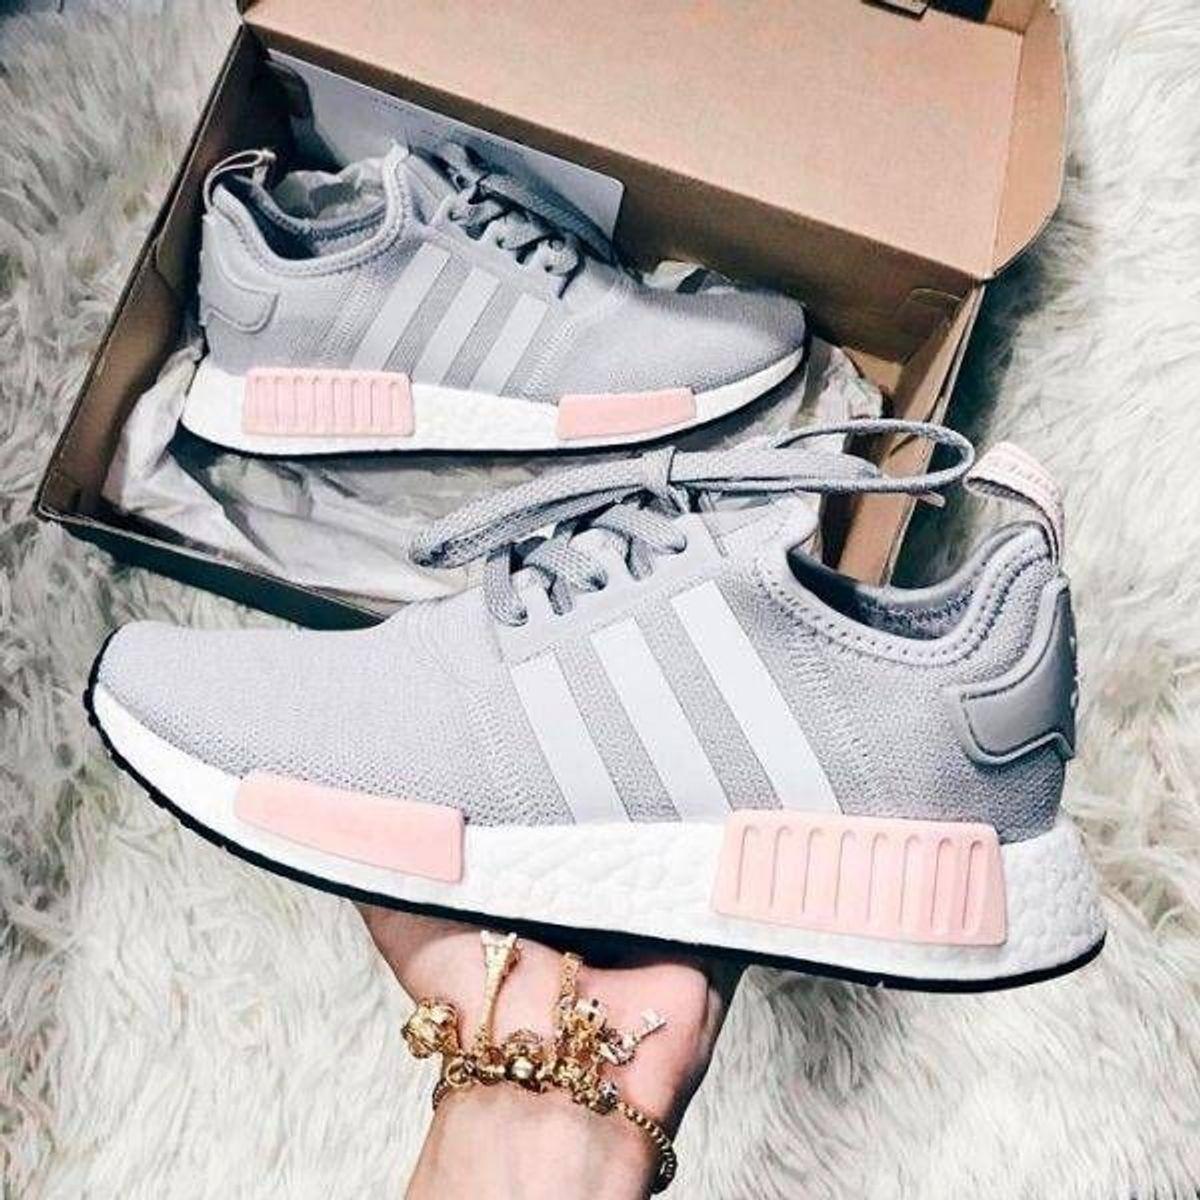 tenis adidas nmd rosa e cinza